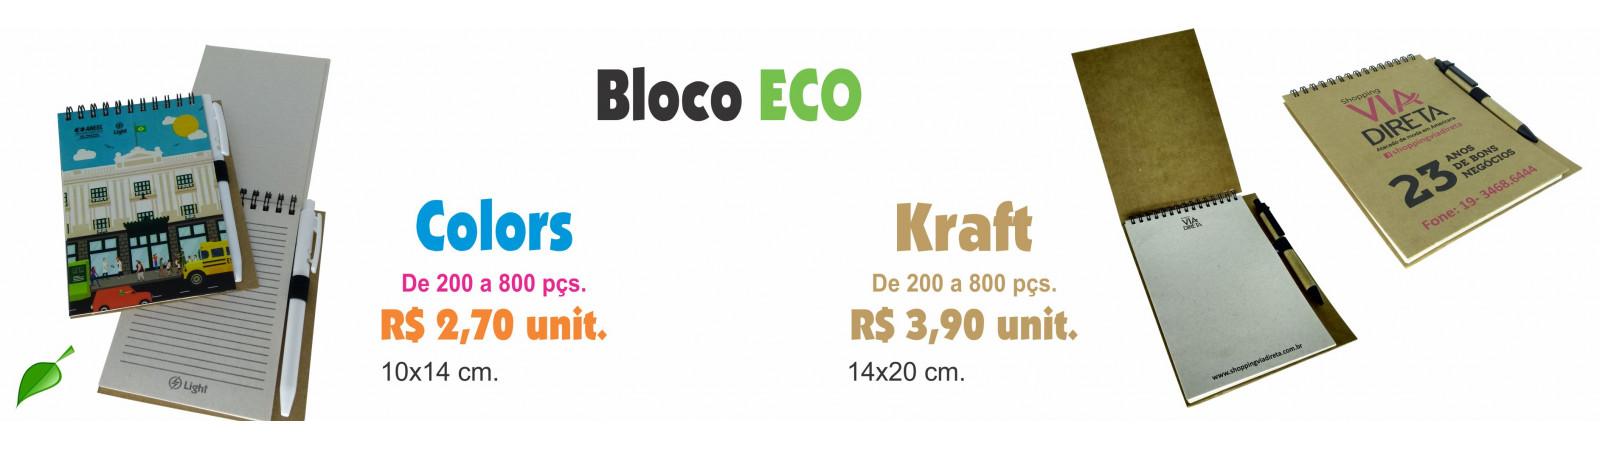 Bloco Eco